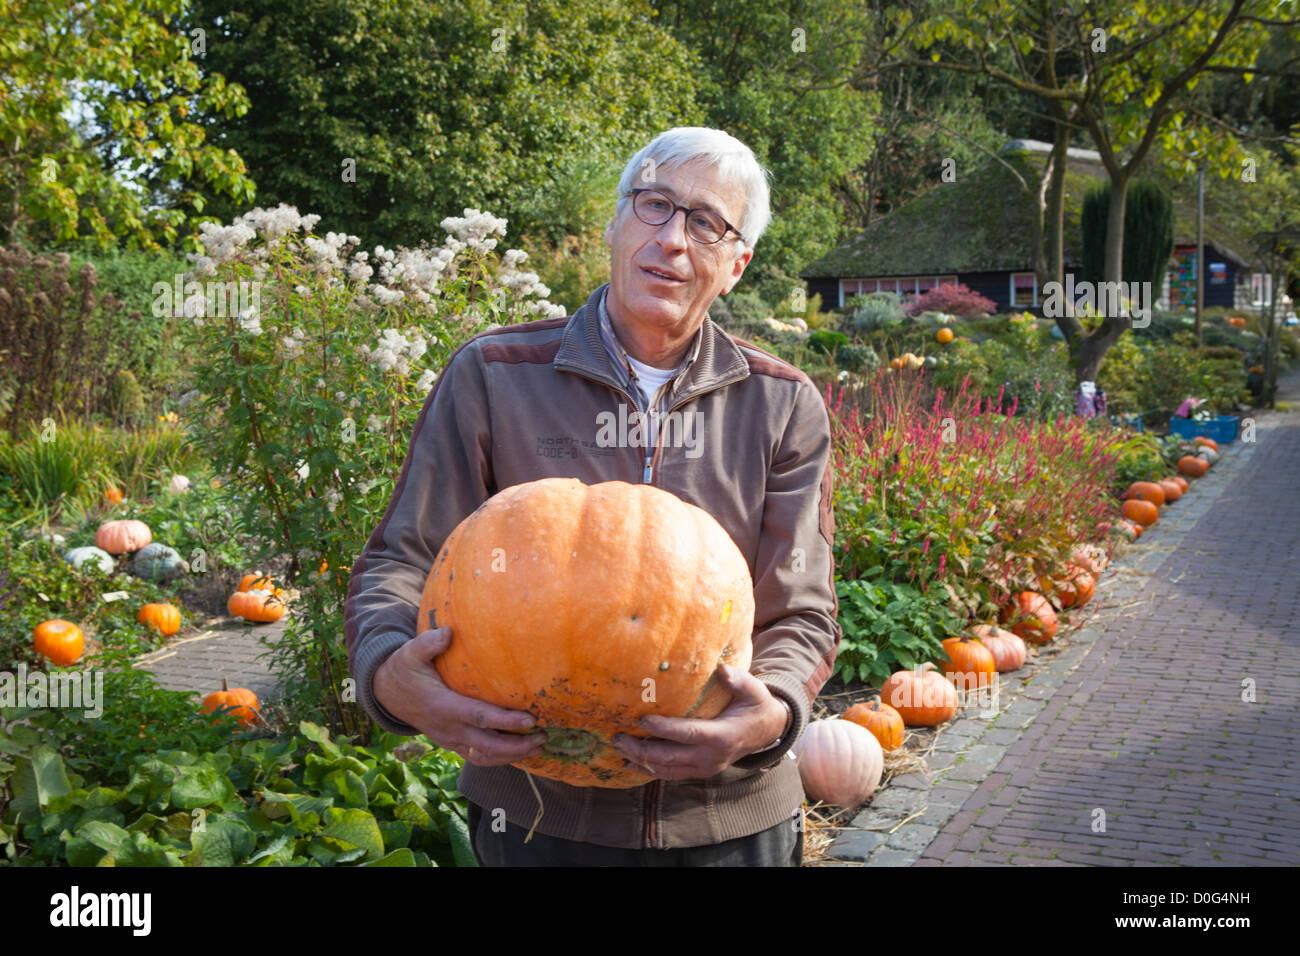 Portrait proud man with big pumpkin in a garden with pumpkins in the Klok and Peel museum in Asten in the Netherlands - Stock Image